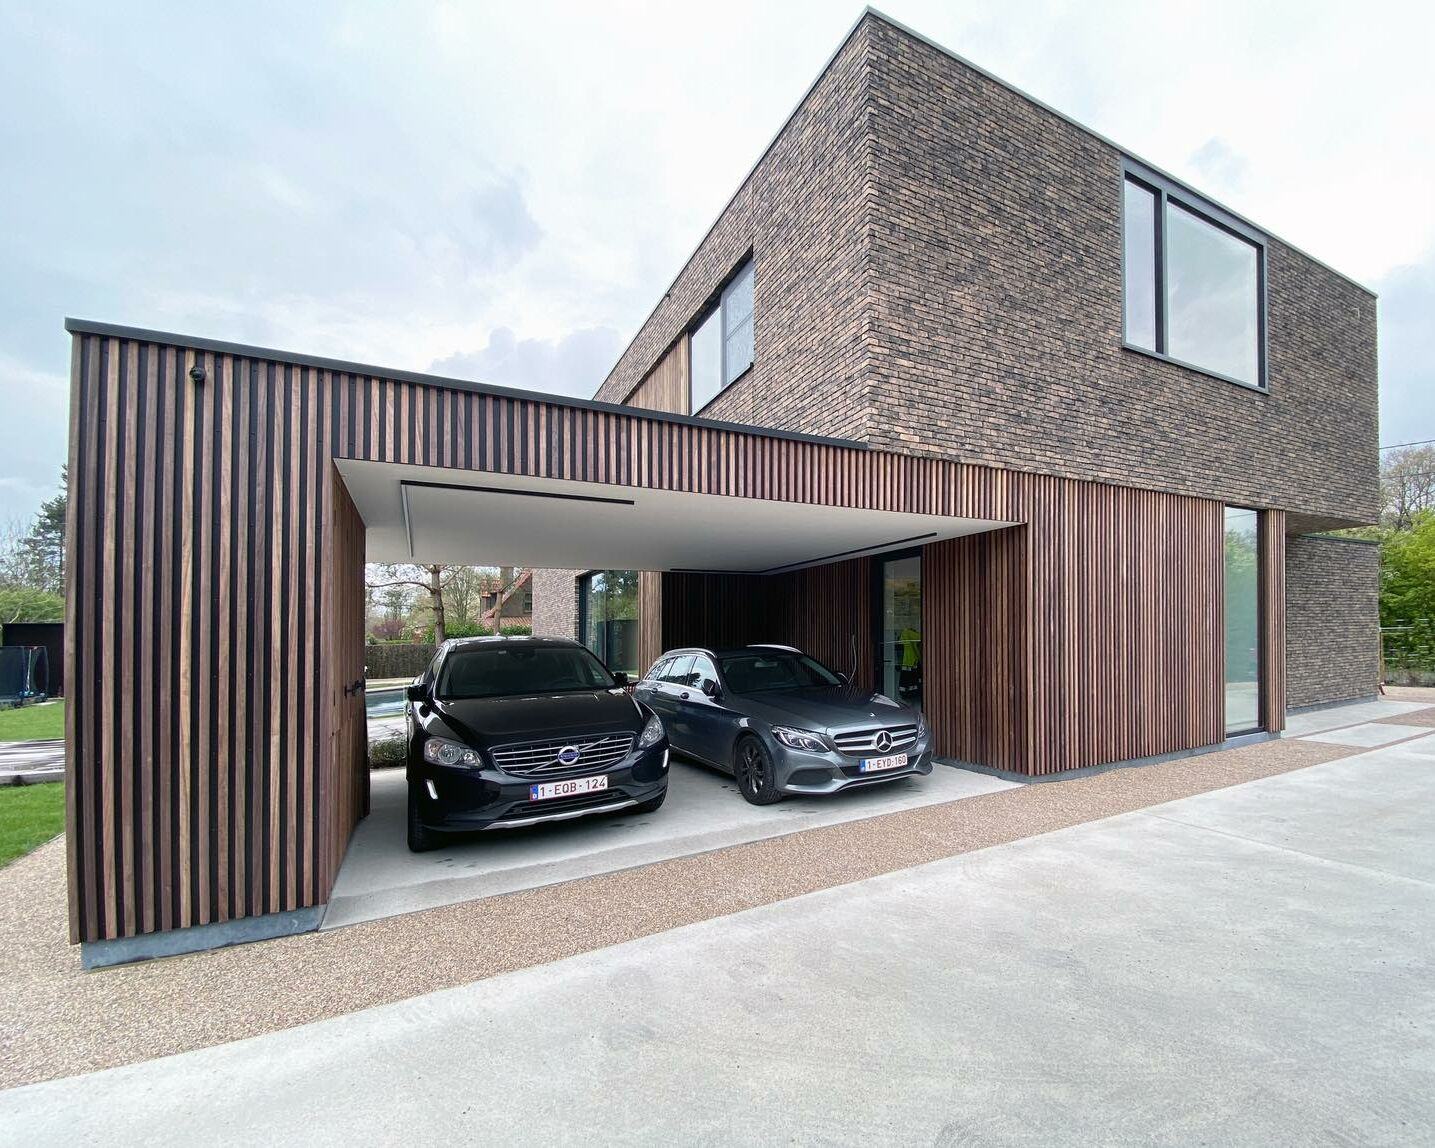 179804193 3994355523975625 6999441974979690958 n uai | Baeyens & Beck architecten Gent | architect nieuwbouw renovatie interieur | high end | architectenbureau